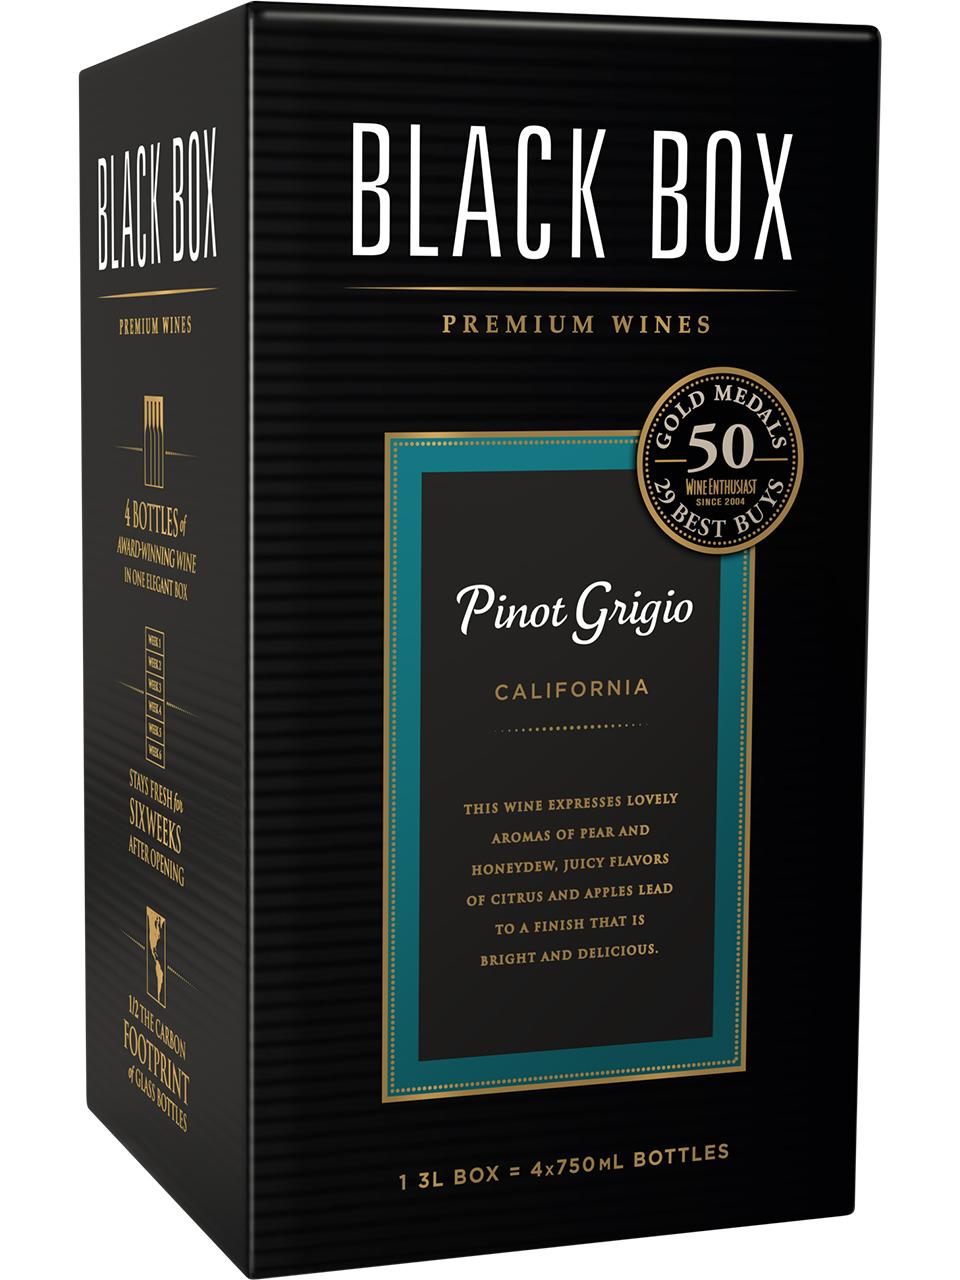 Black Box Pinot Grigio